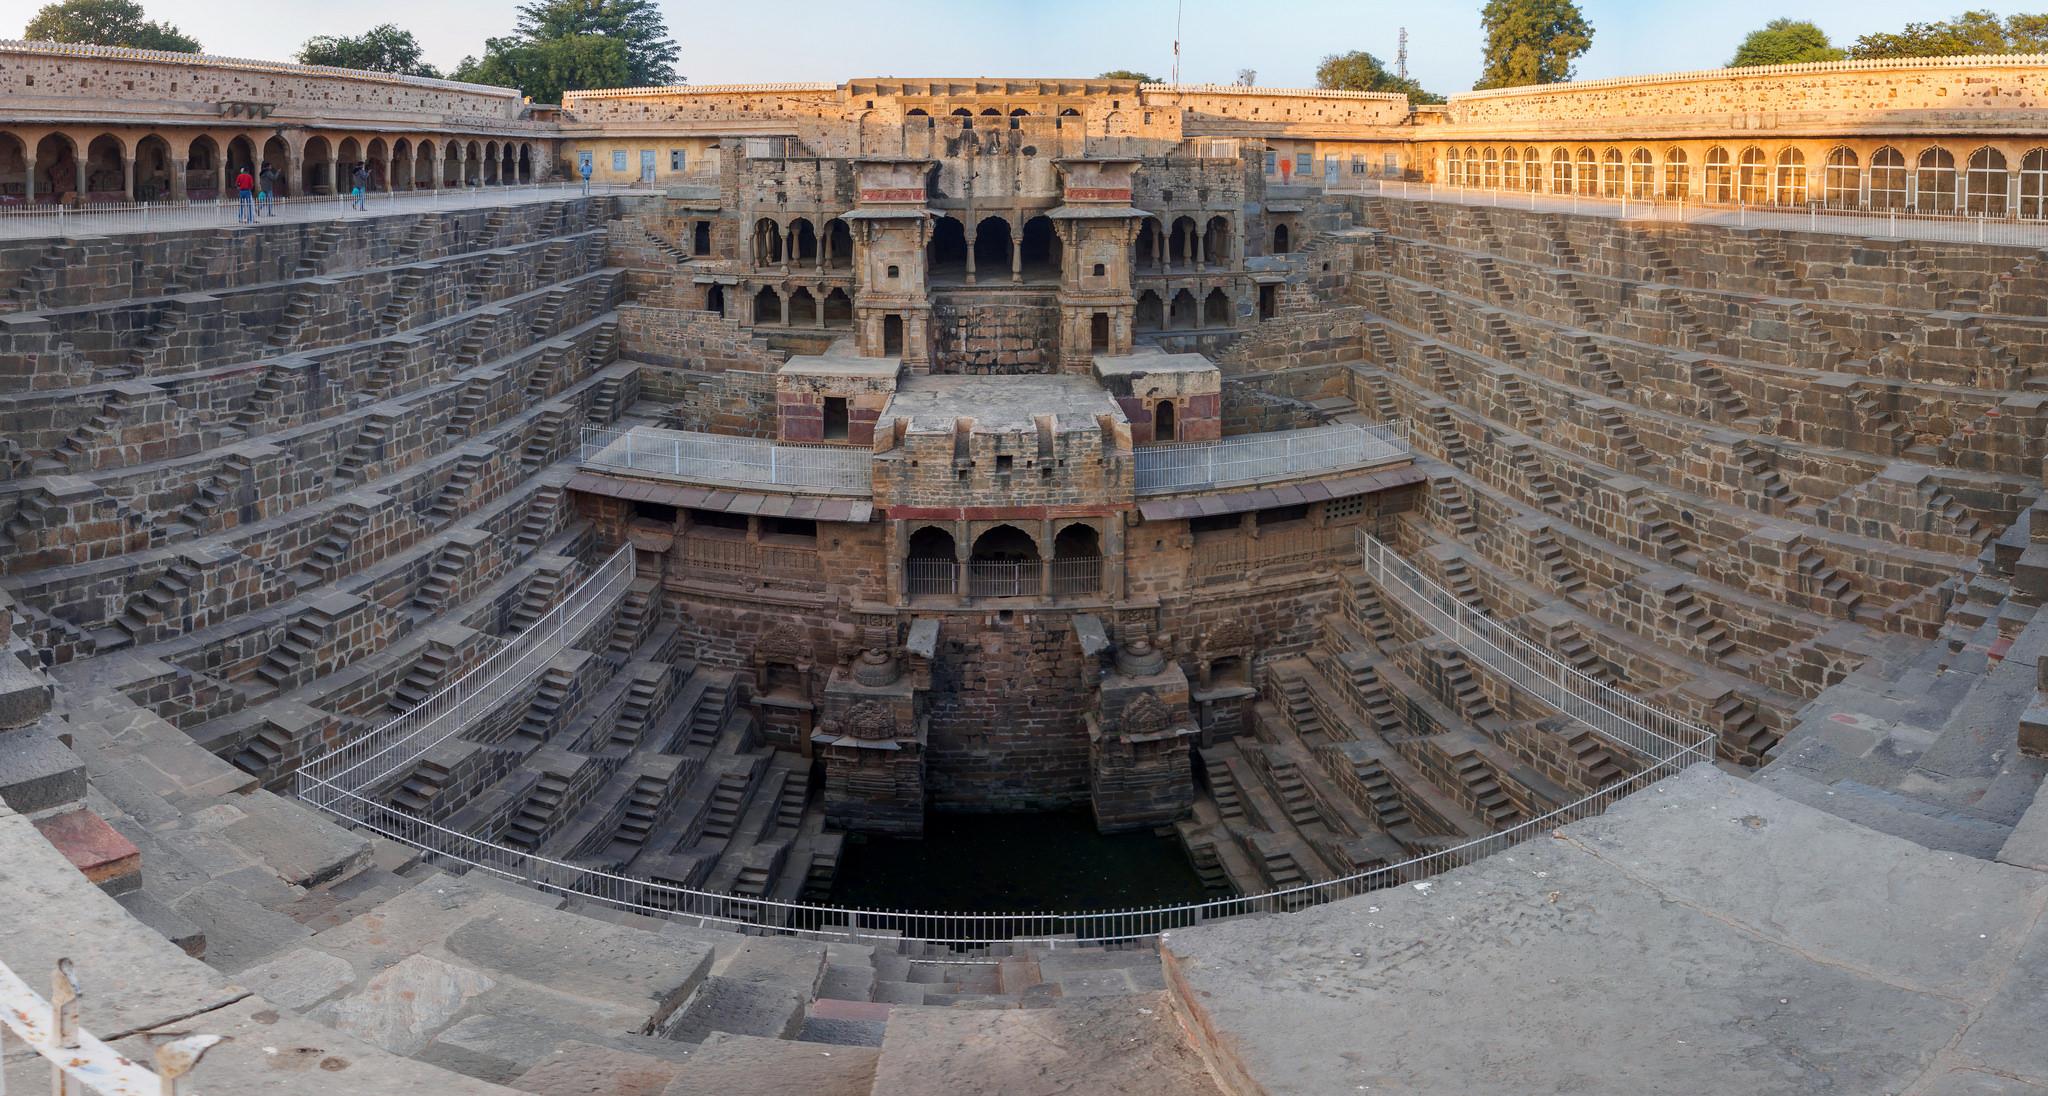 Detail of Chand Baori, Abhaneri, Rajasthan, India скачать